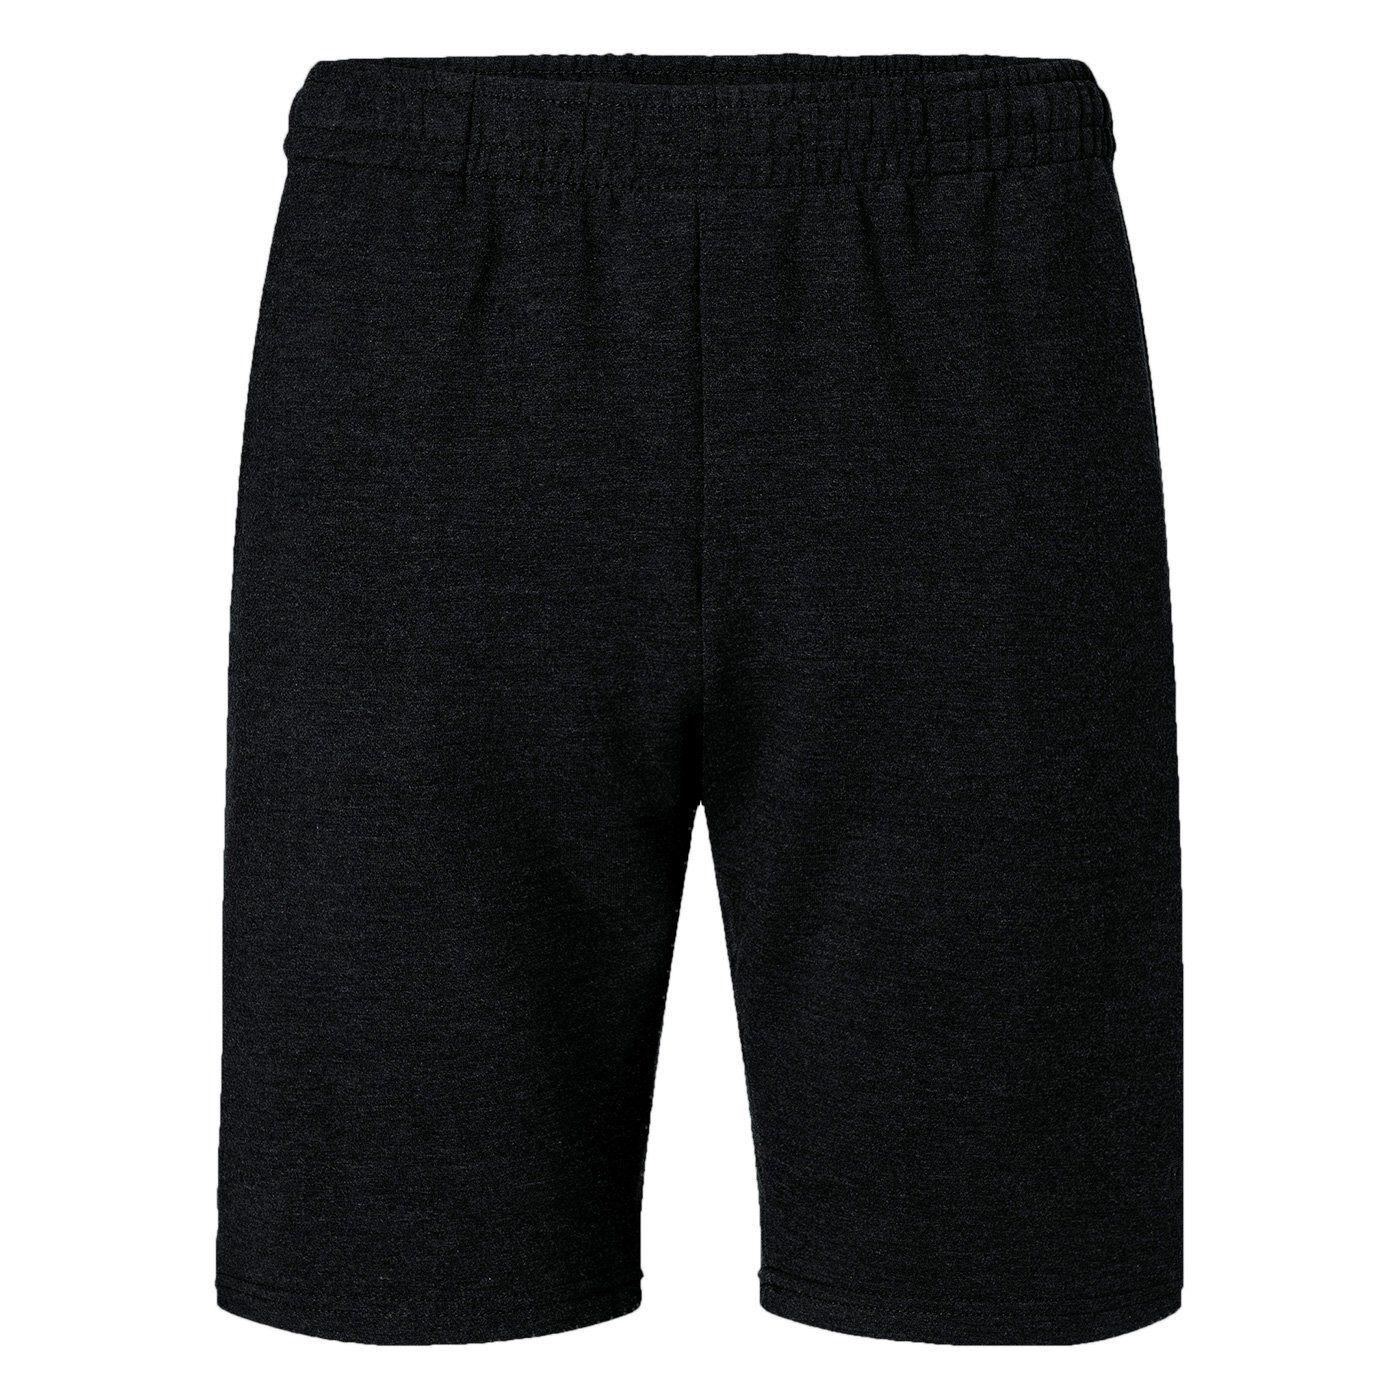 DEPROC Active Shorts »KENTVILLE MEN Sport &Freizeit Short«, schwarz